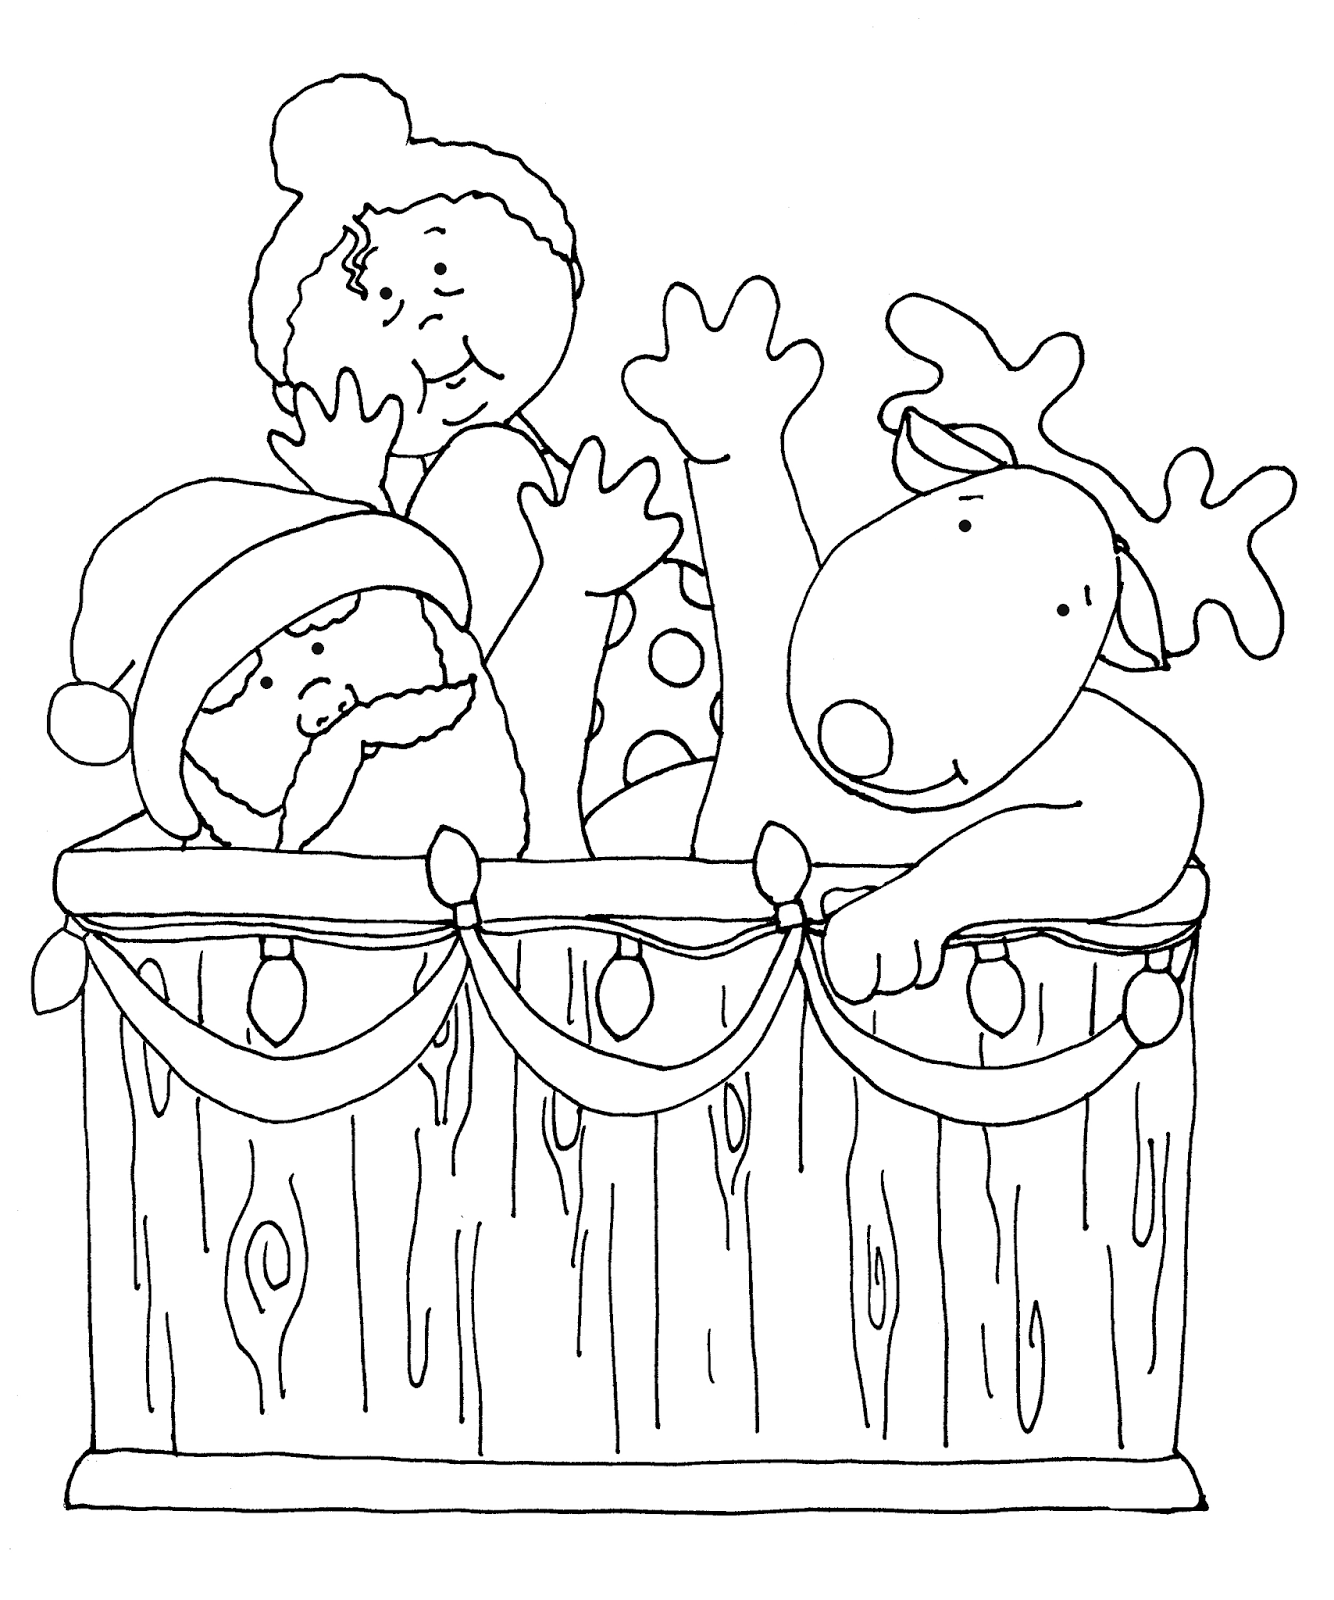 Free Dearie Dolls Digi Stamps: Santa's Hot Tub...the